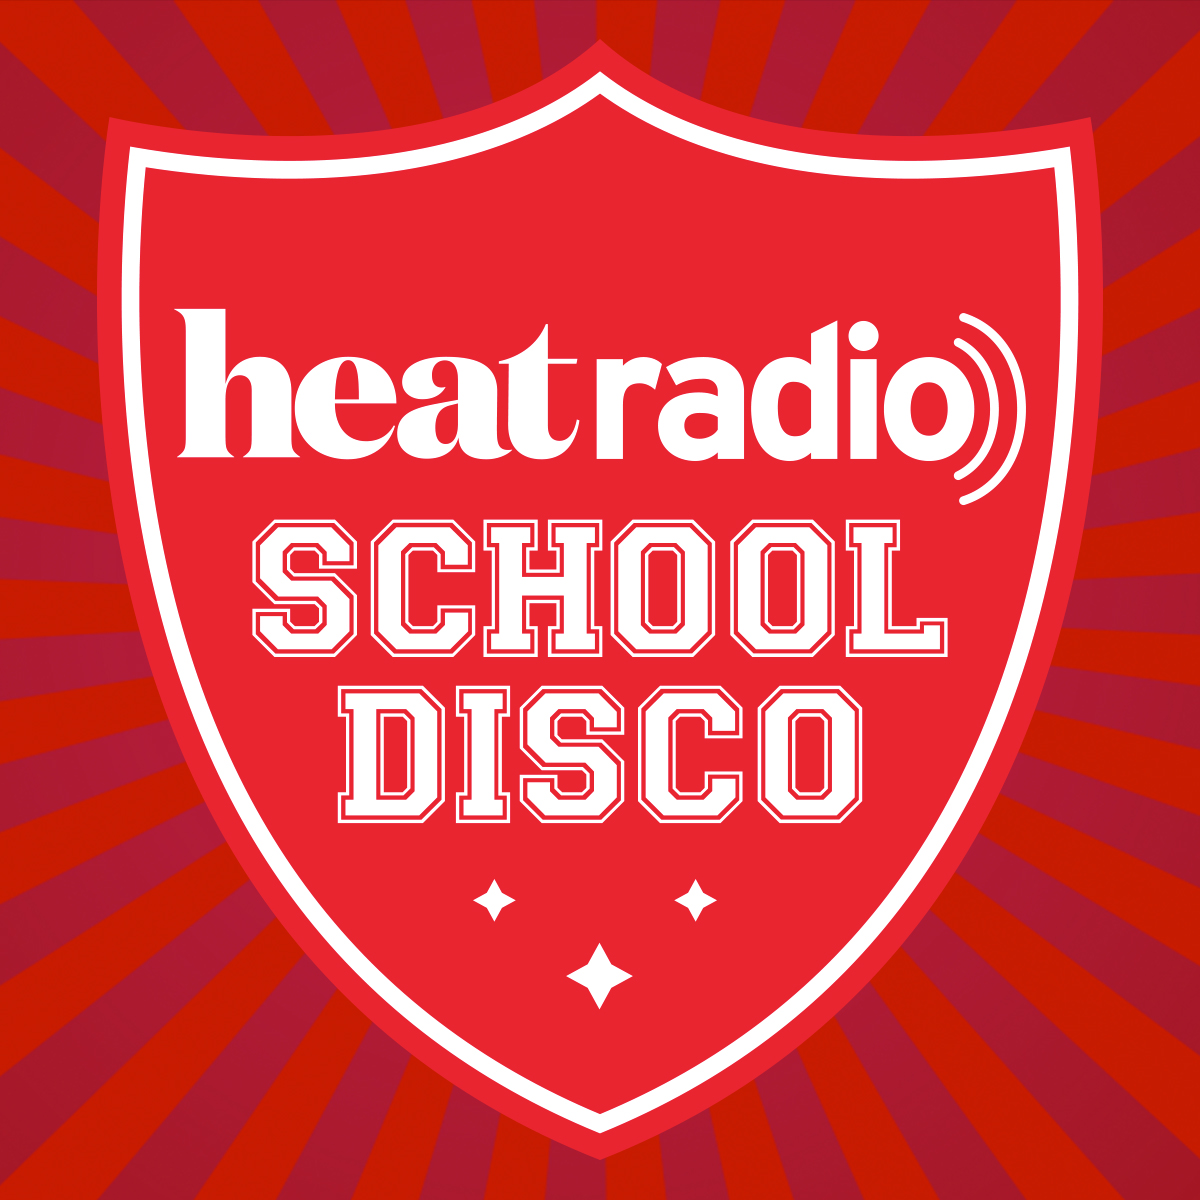 Playlist | Recently Played Music | Upcoming Tracks - heat Radio